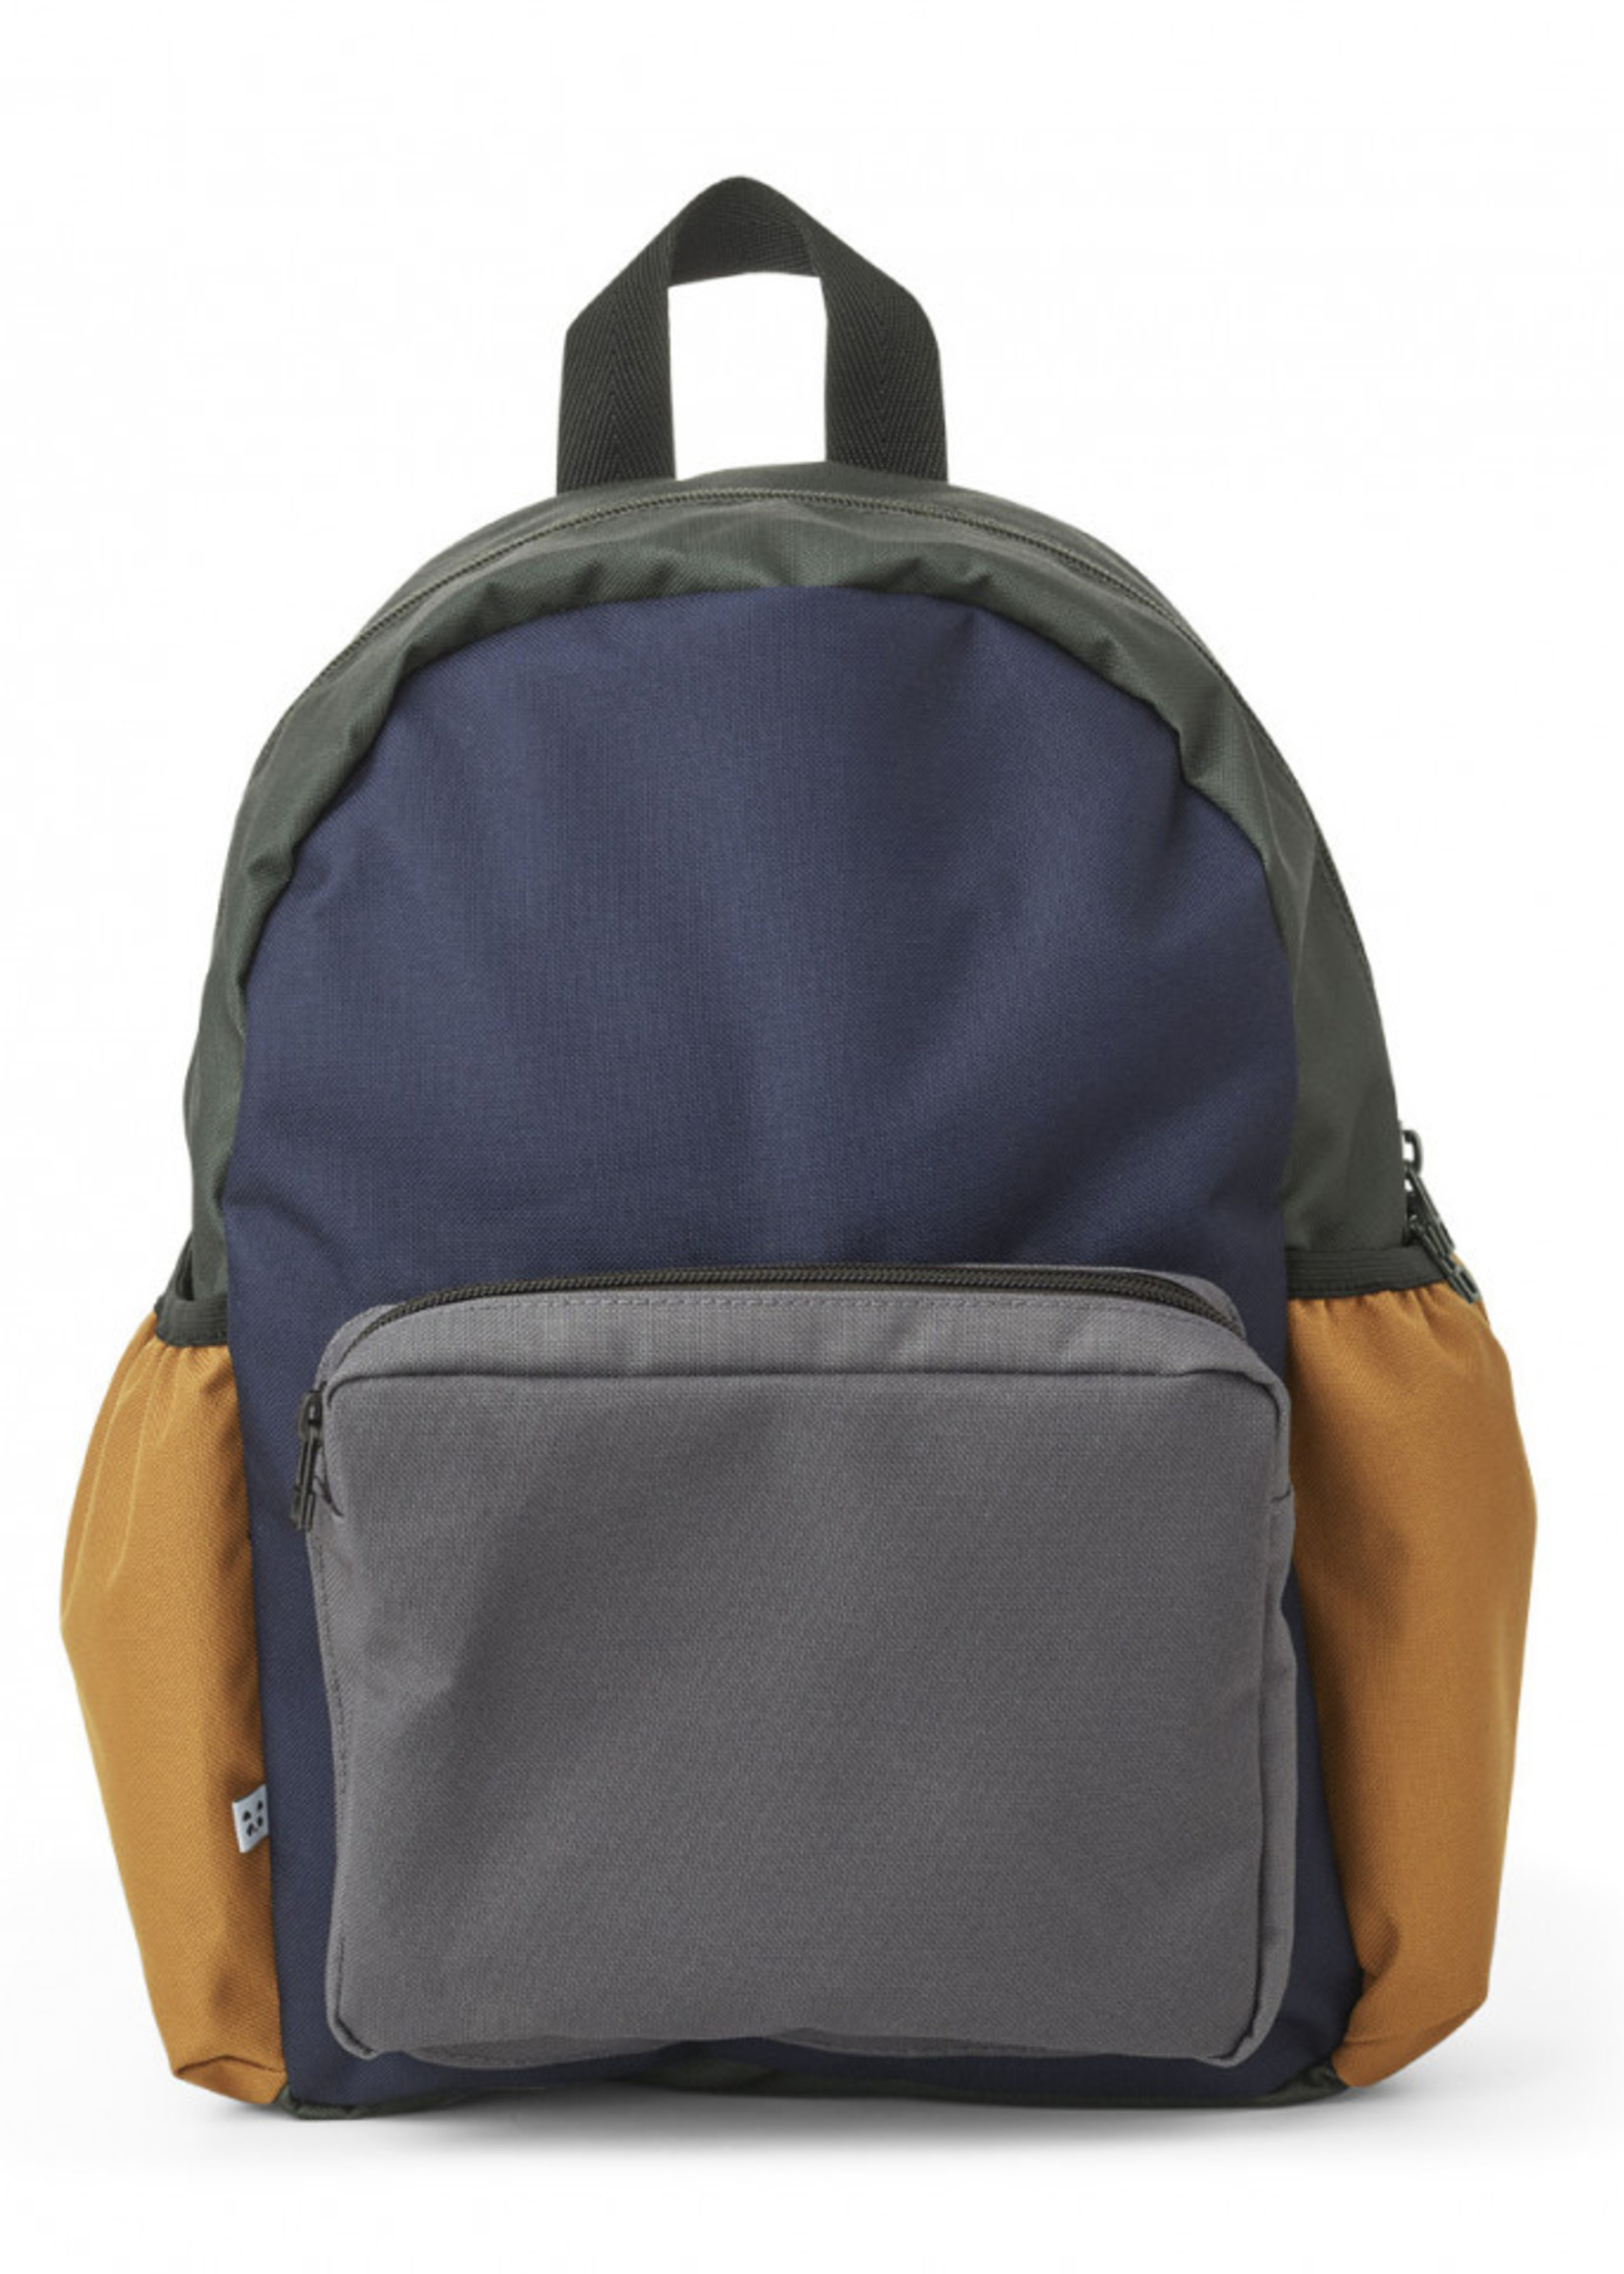 liewood Liewood-AW21 LW13013 Wally school back pack